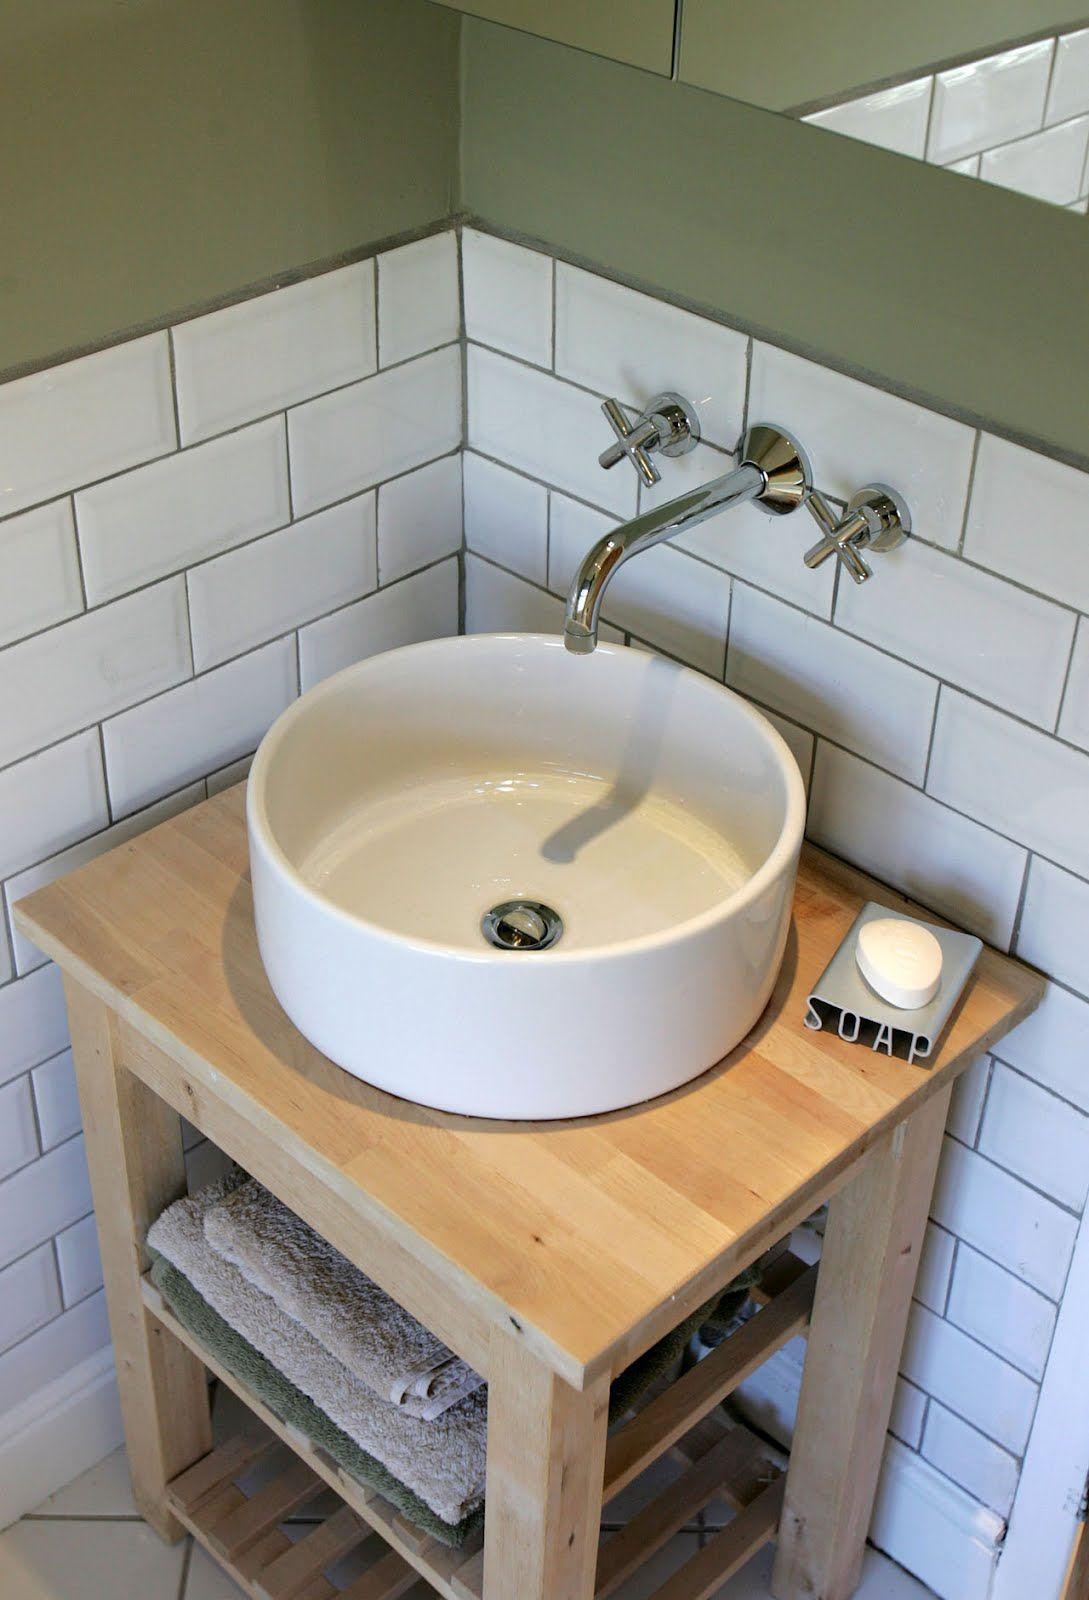 Tiny bathroom vanity that has some counter space.  Meuble vasque